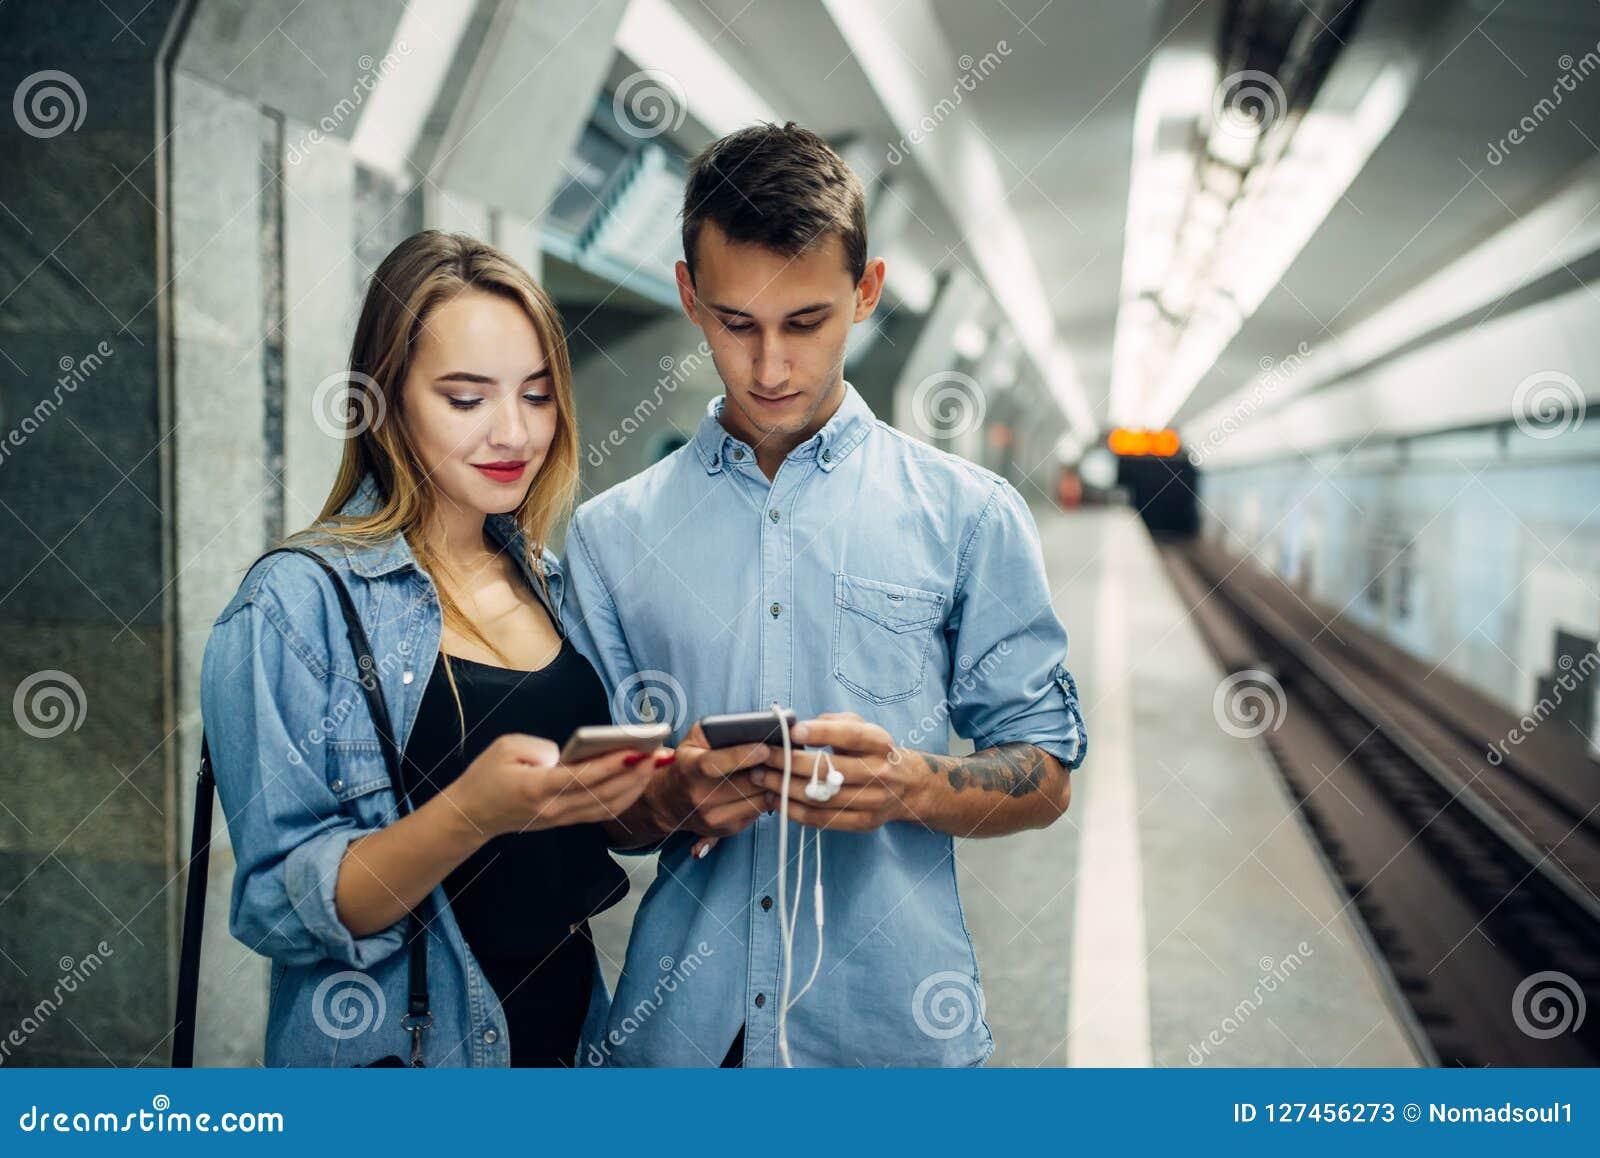 Phone addict couple using gadget in subway